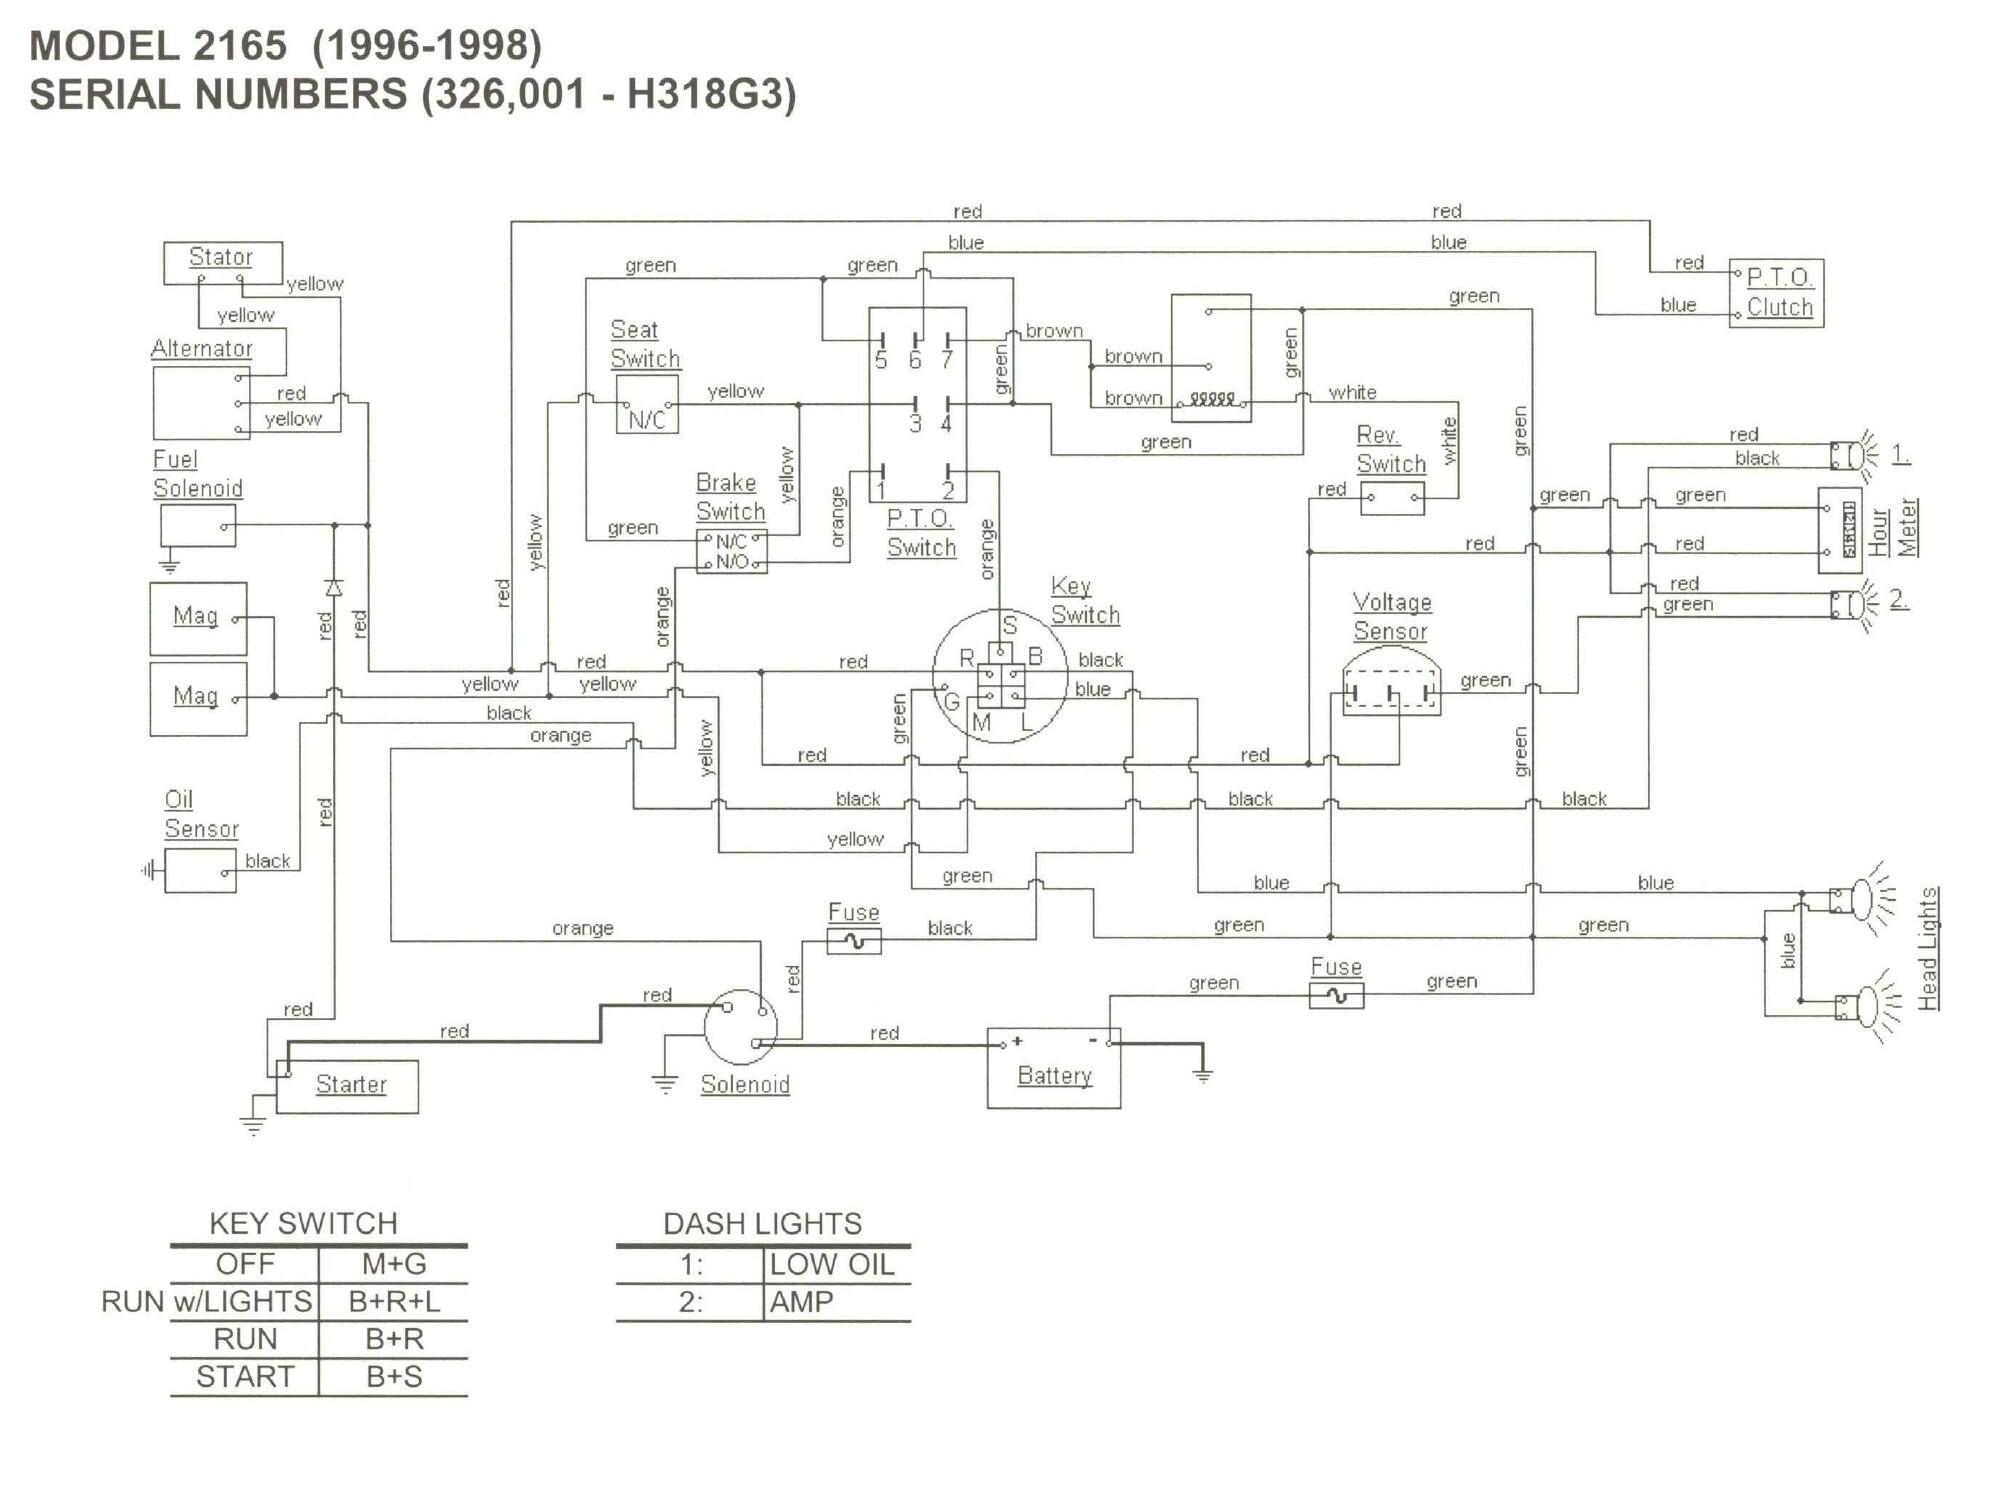 cub cadet 2185 wiring diagram schematic wiring diagrams u2022 rh detox design co Cub Cadet RZT 50 Wiring Diagram Cub Cadet RZT 50 Wiring Diagram